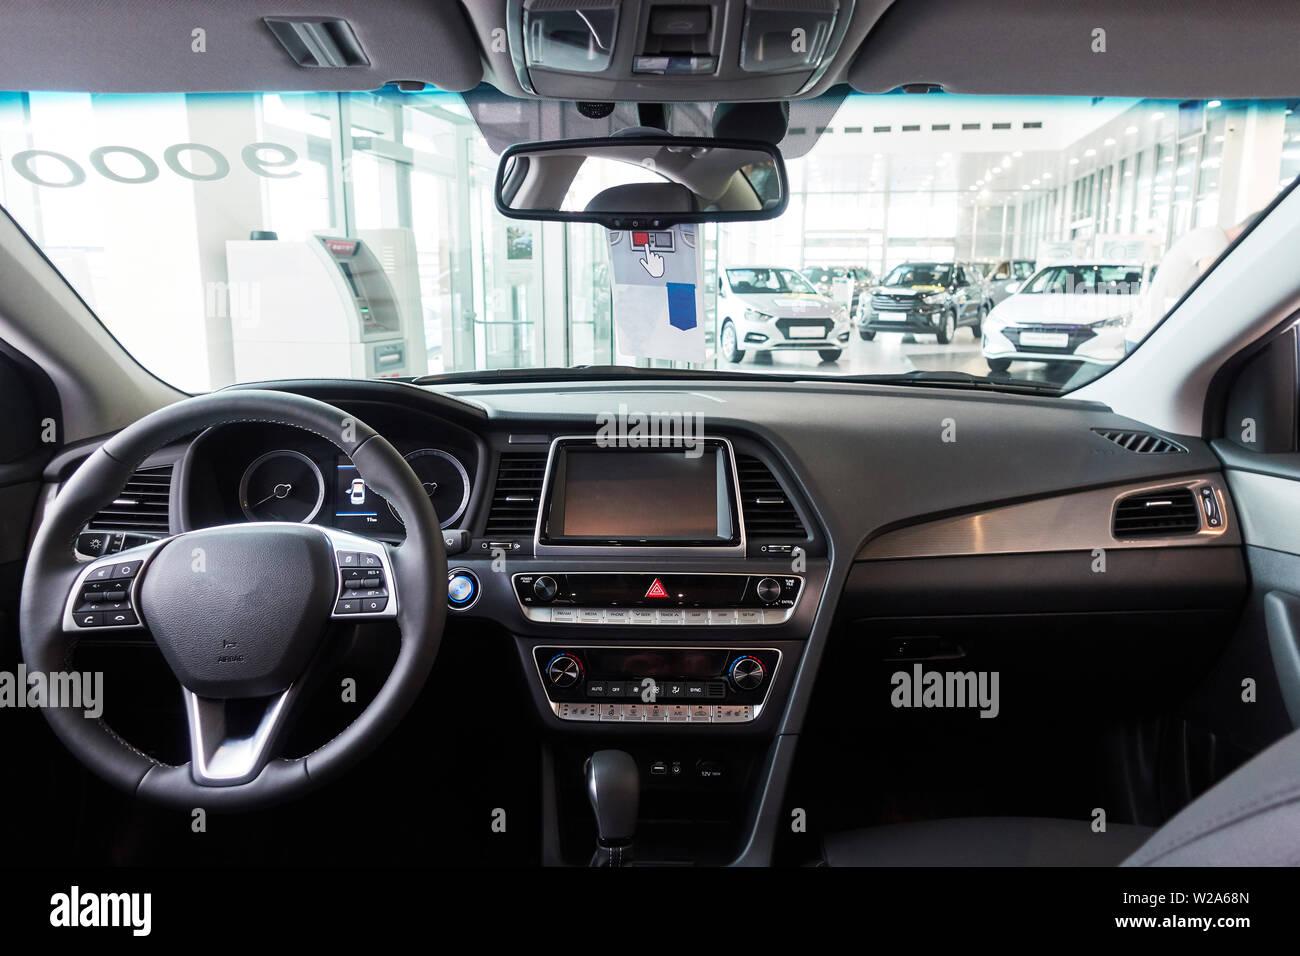 The Car Inside The Driver S Seat The Interior Of A Prestigious Modern Car New Car Inside Stock Photo Alamy